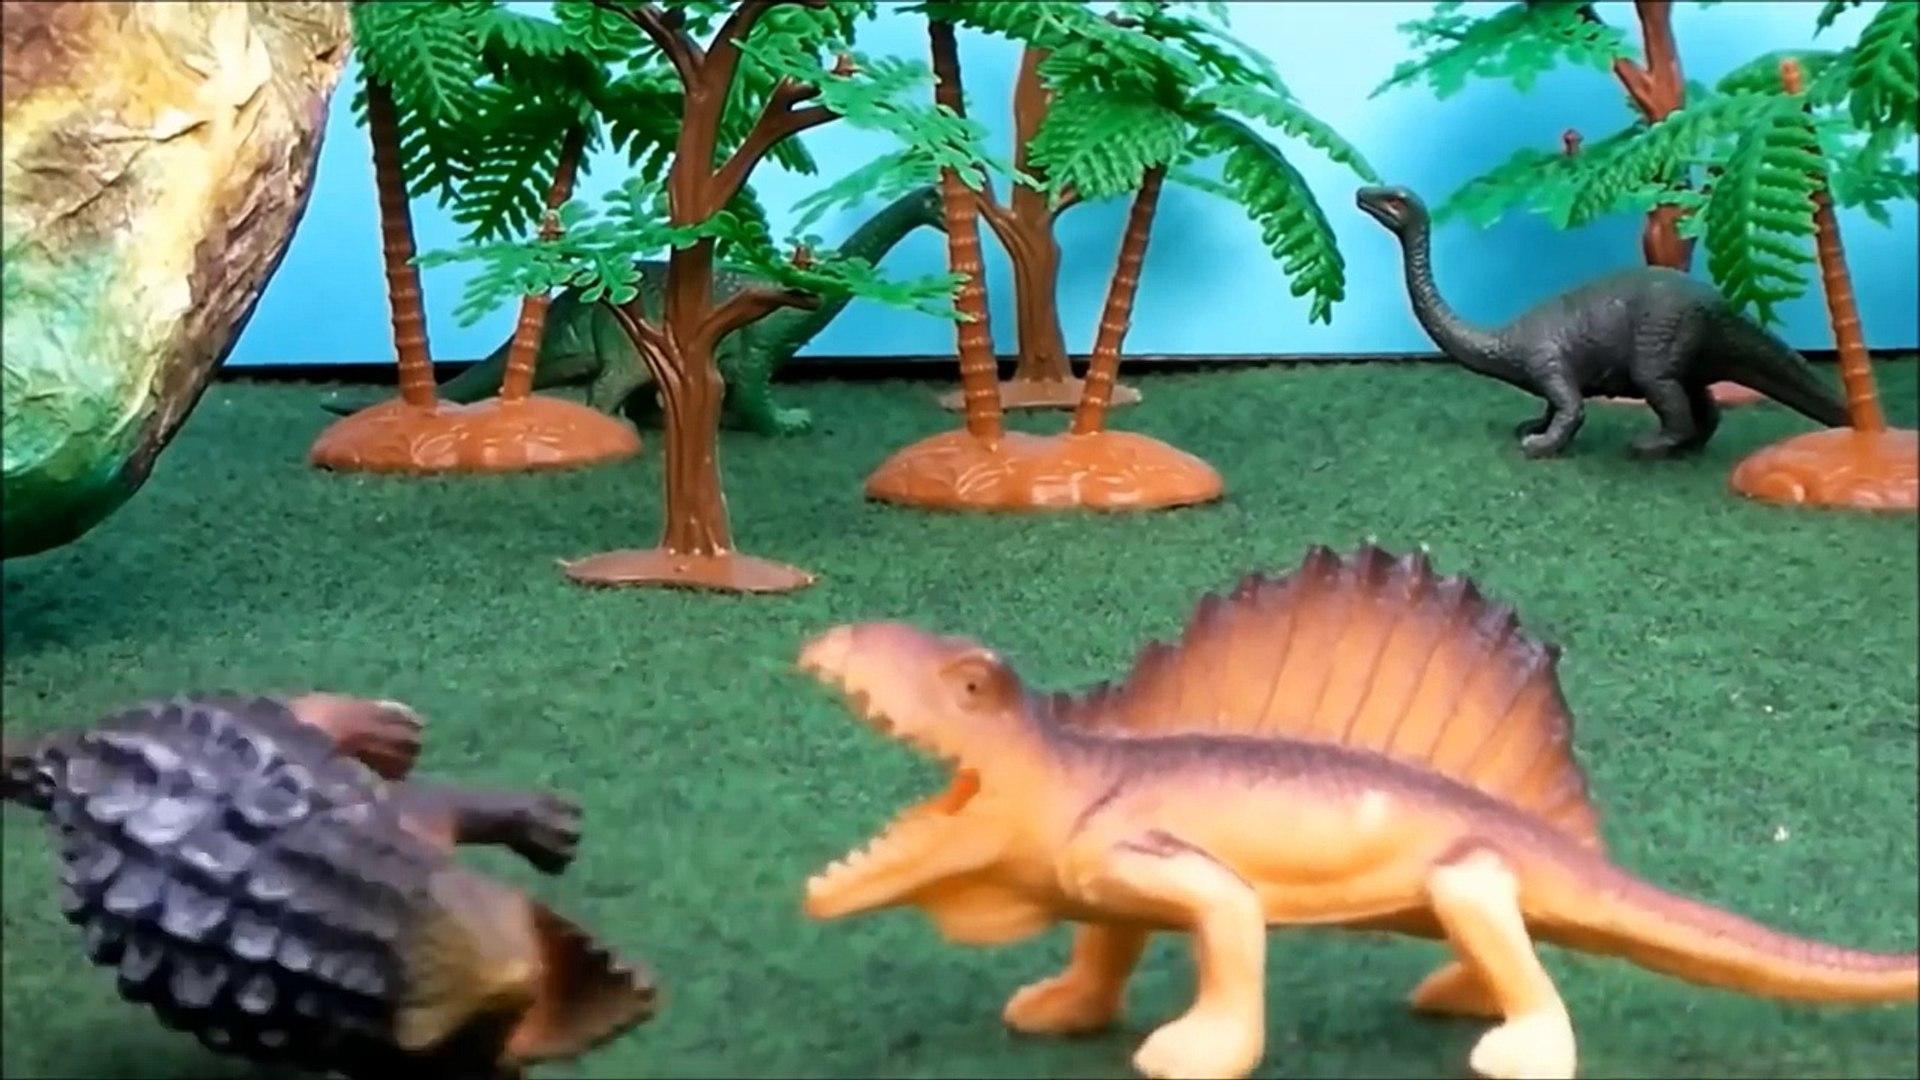 Equilibrar Dinosaurio De Planeta Poder El Spinosaurus Vs Carcharodontosaurus Bbc